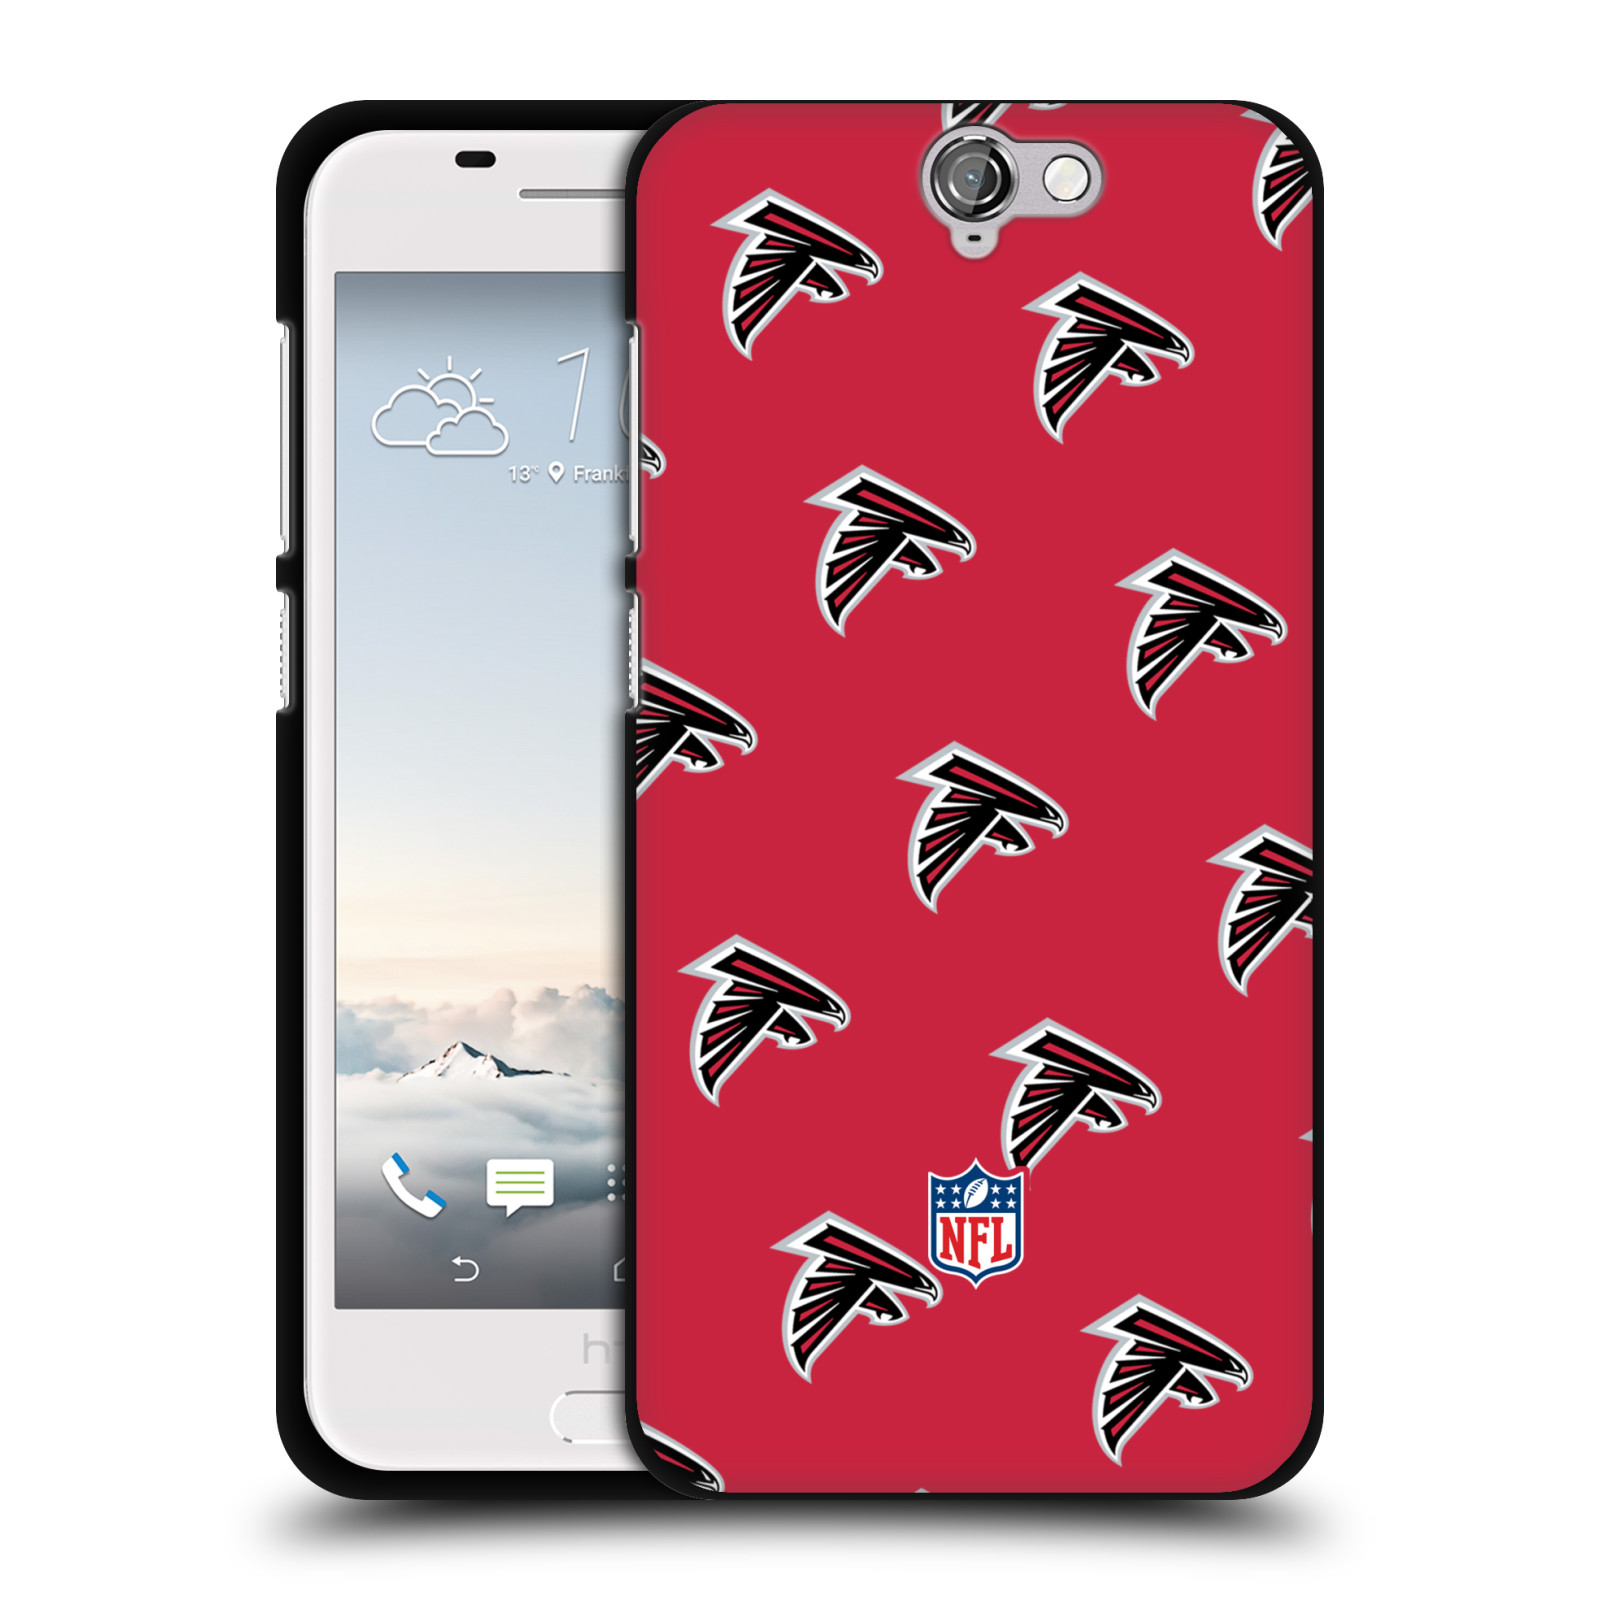 OFFICIAL-NFL-2017-18-ATLANTA-FALCONS-BLACK-SOFT-GEL-CASE-FOR-HTC-PHONES